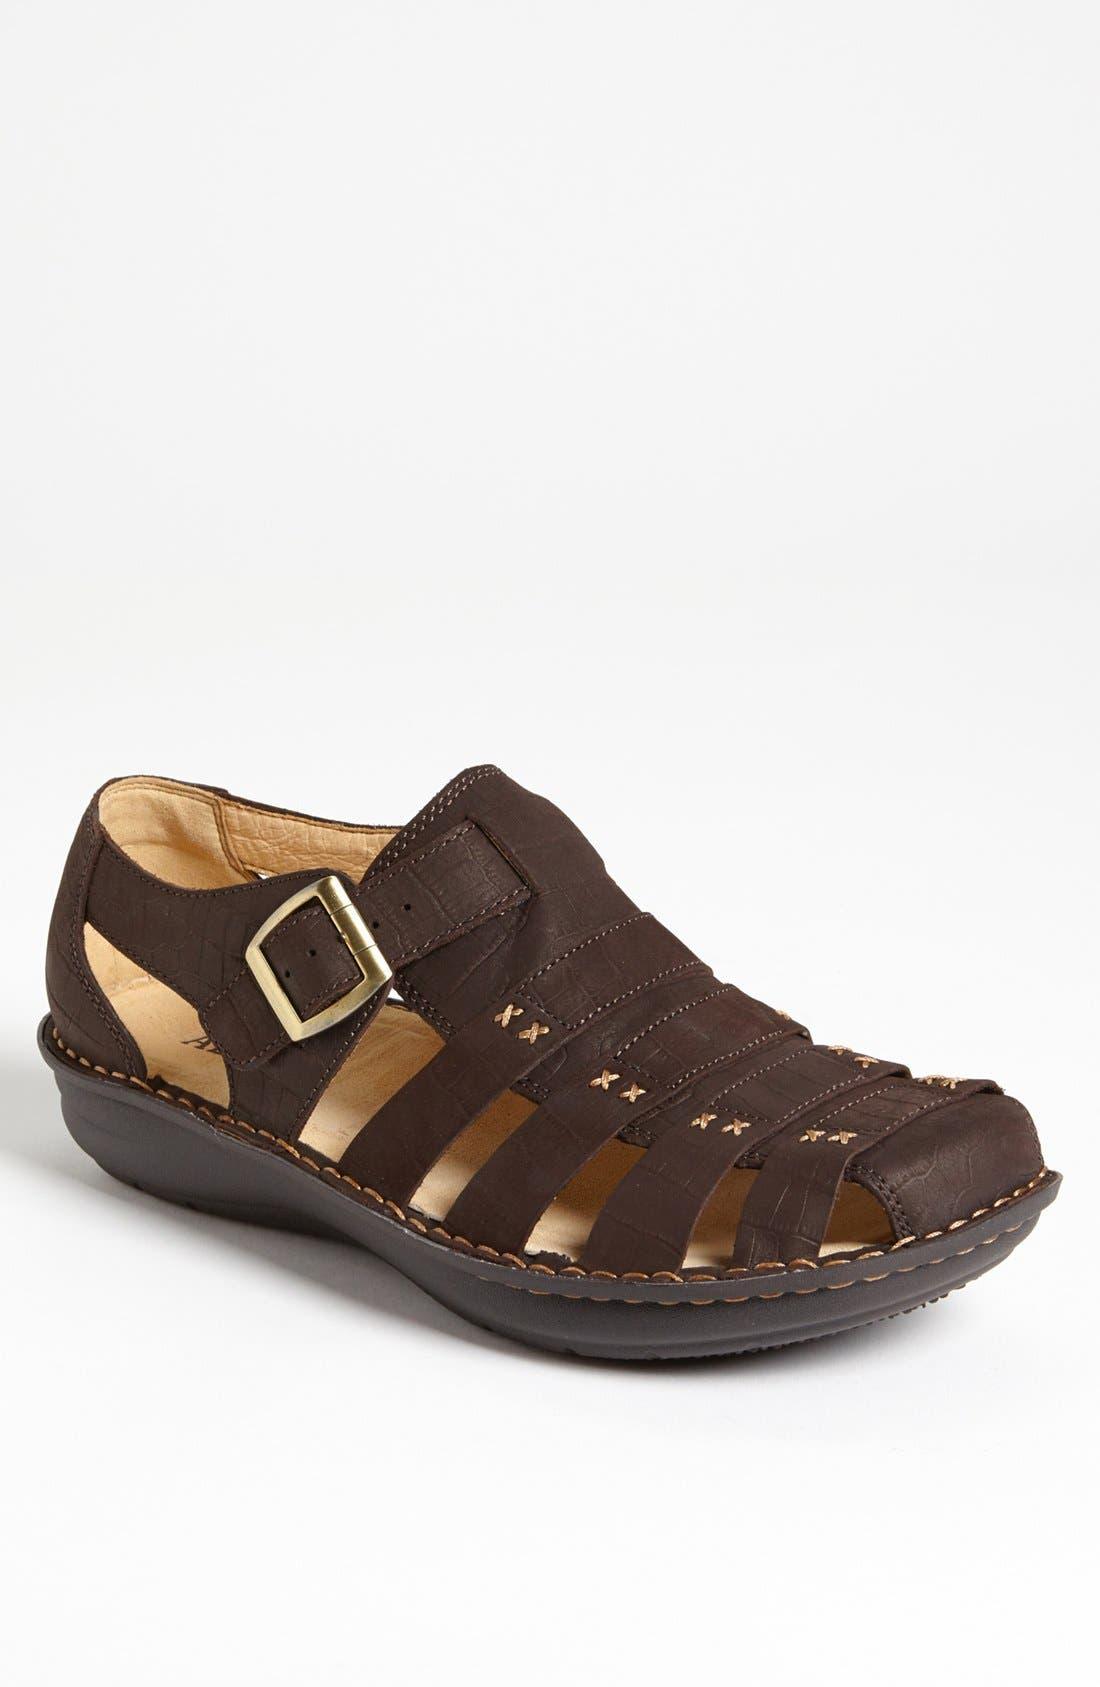 Alternate Image 1 Selected - Alegria 'Martinique' Sandal